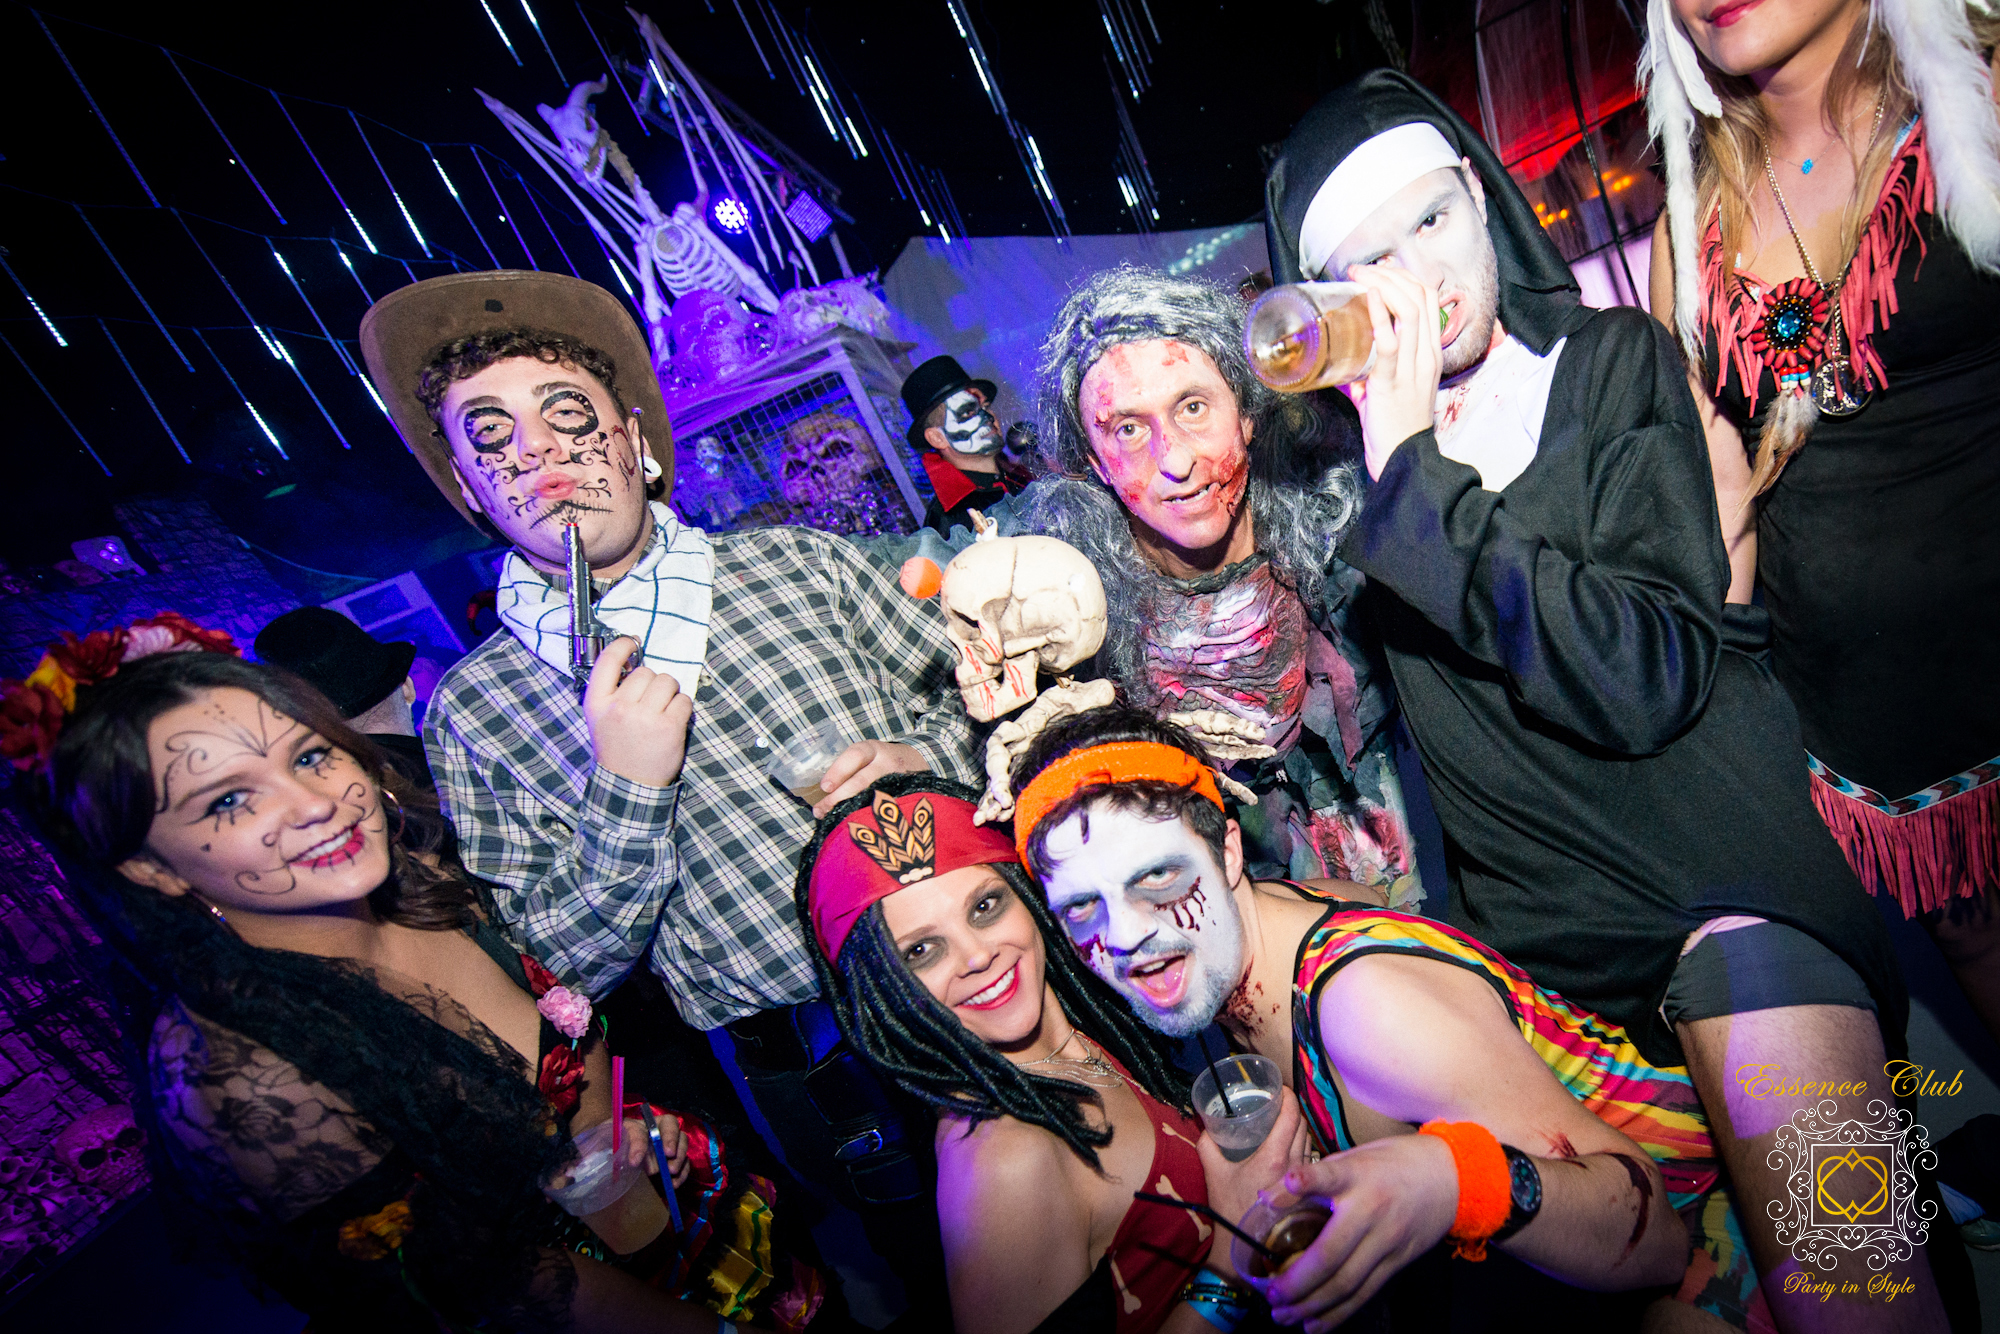 Essence Club Underworld Party